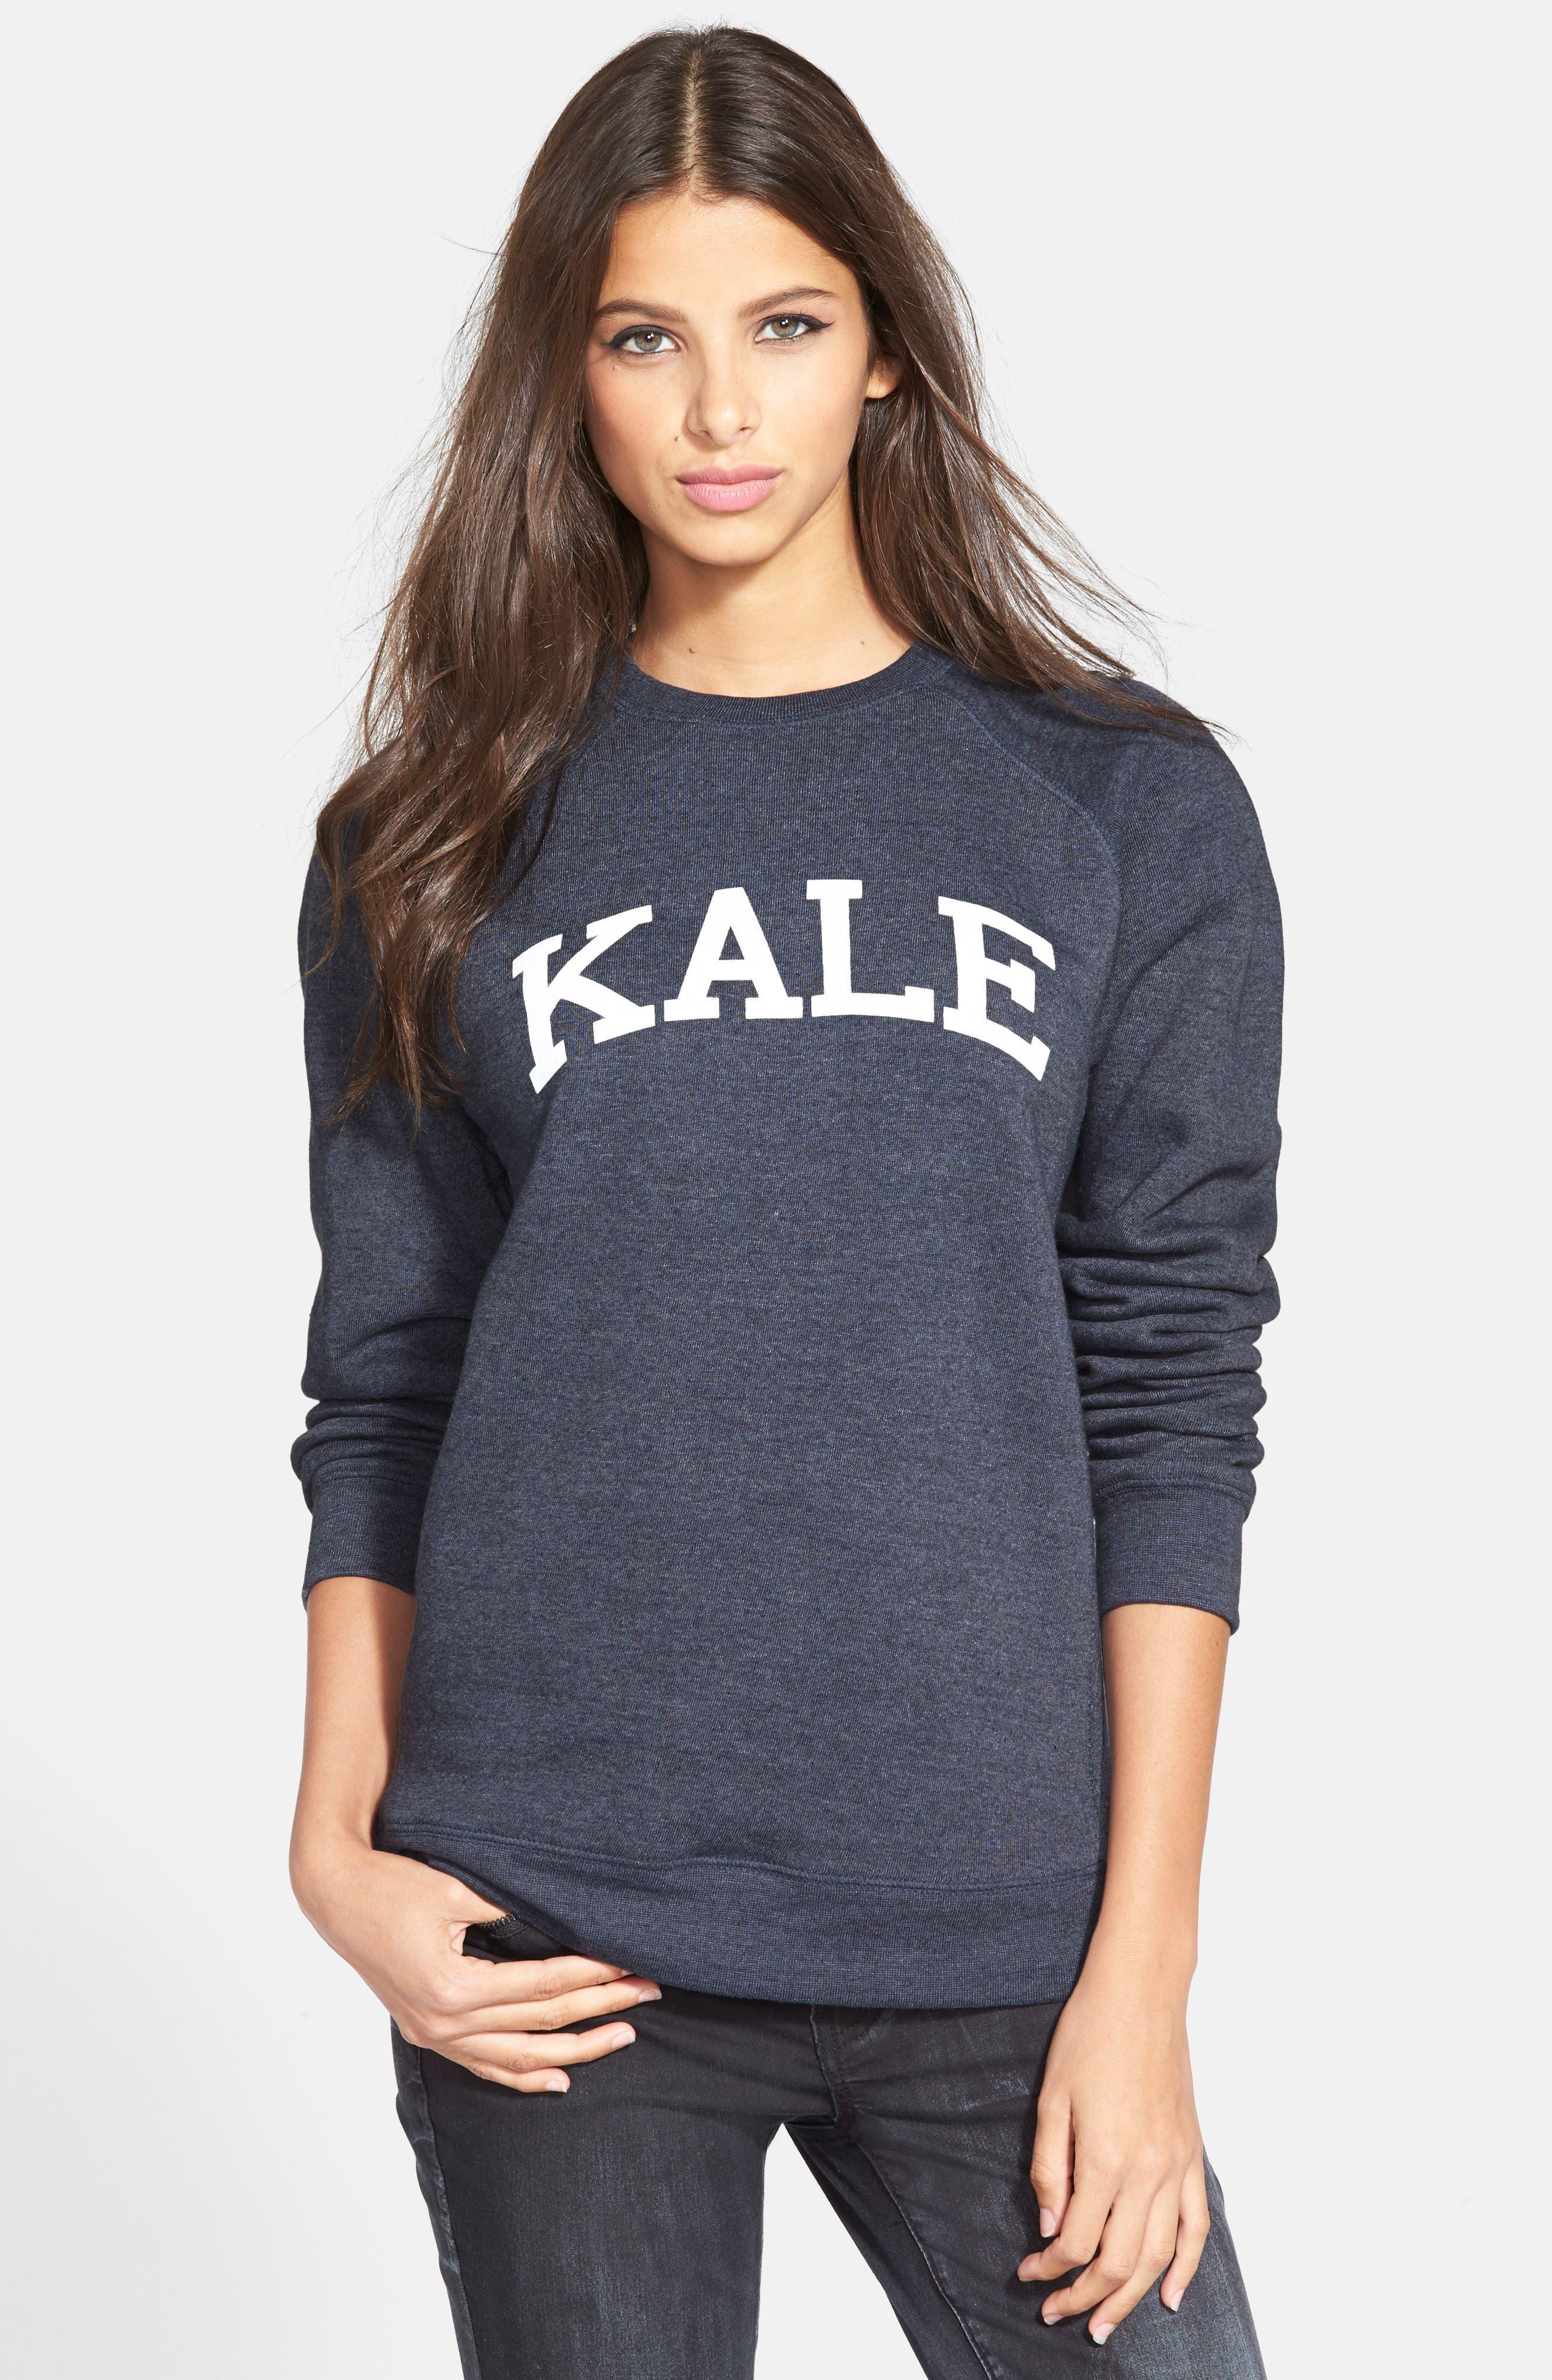 'Kale' Raglan Sweatshirt,                             Alternate thumbnail 2, color,                             410